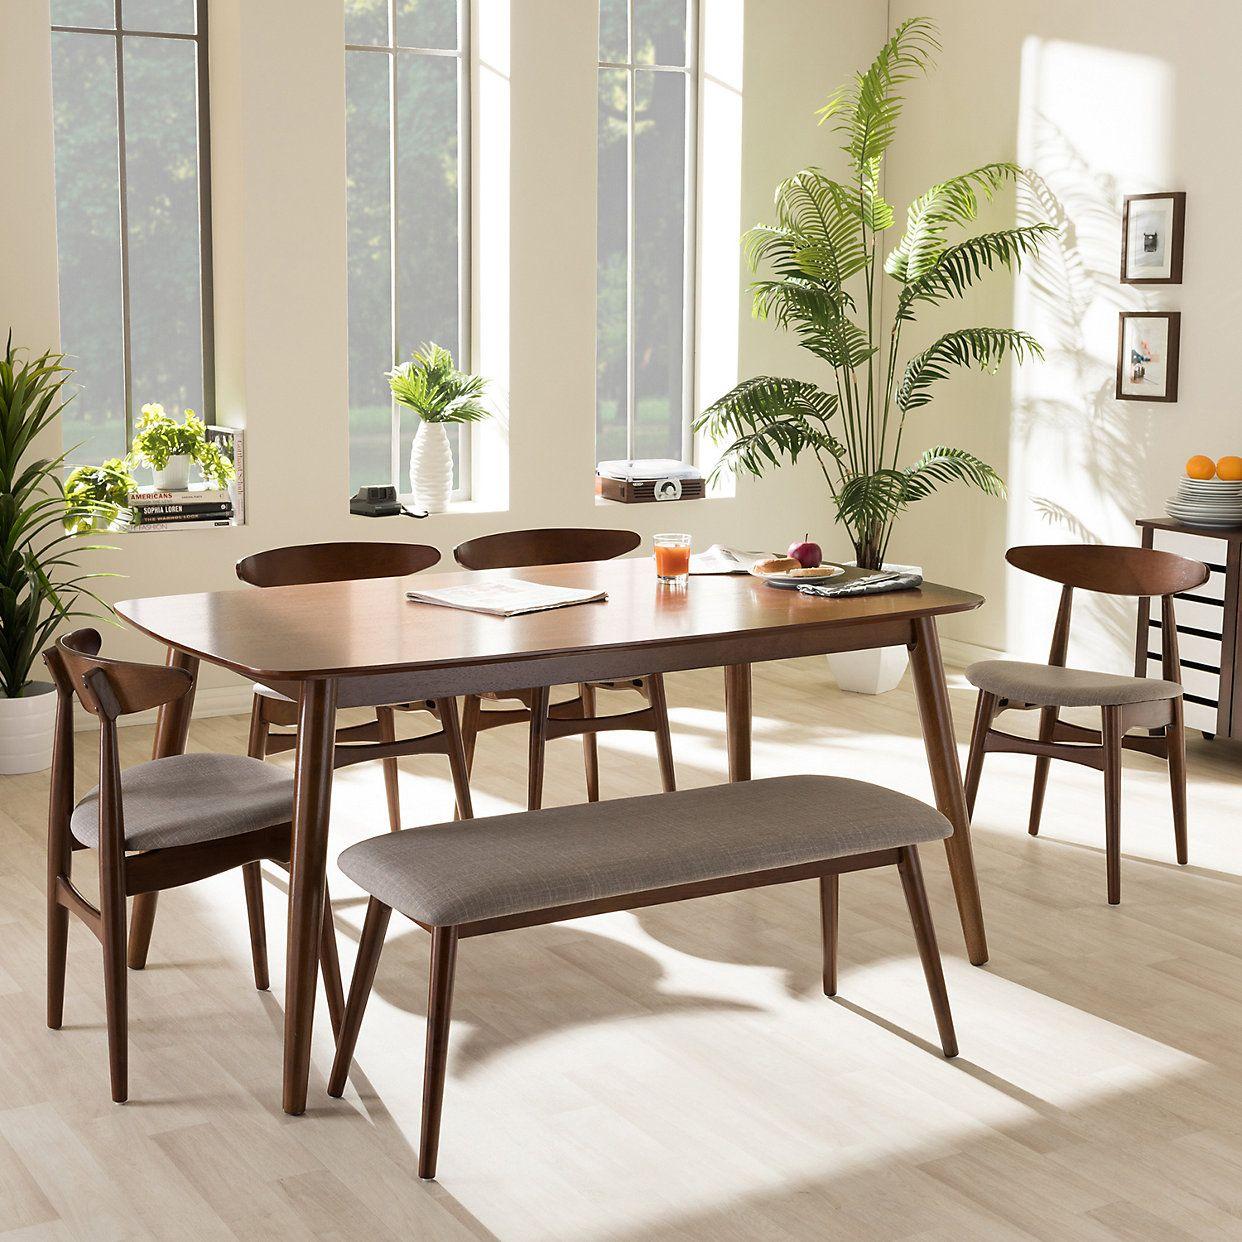 Baxton Studio Flora Dining Table, Chair & Bench 6-piece Set | Kohls